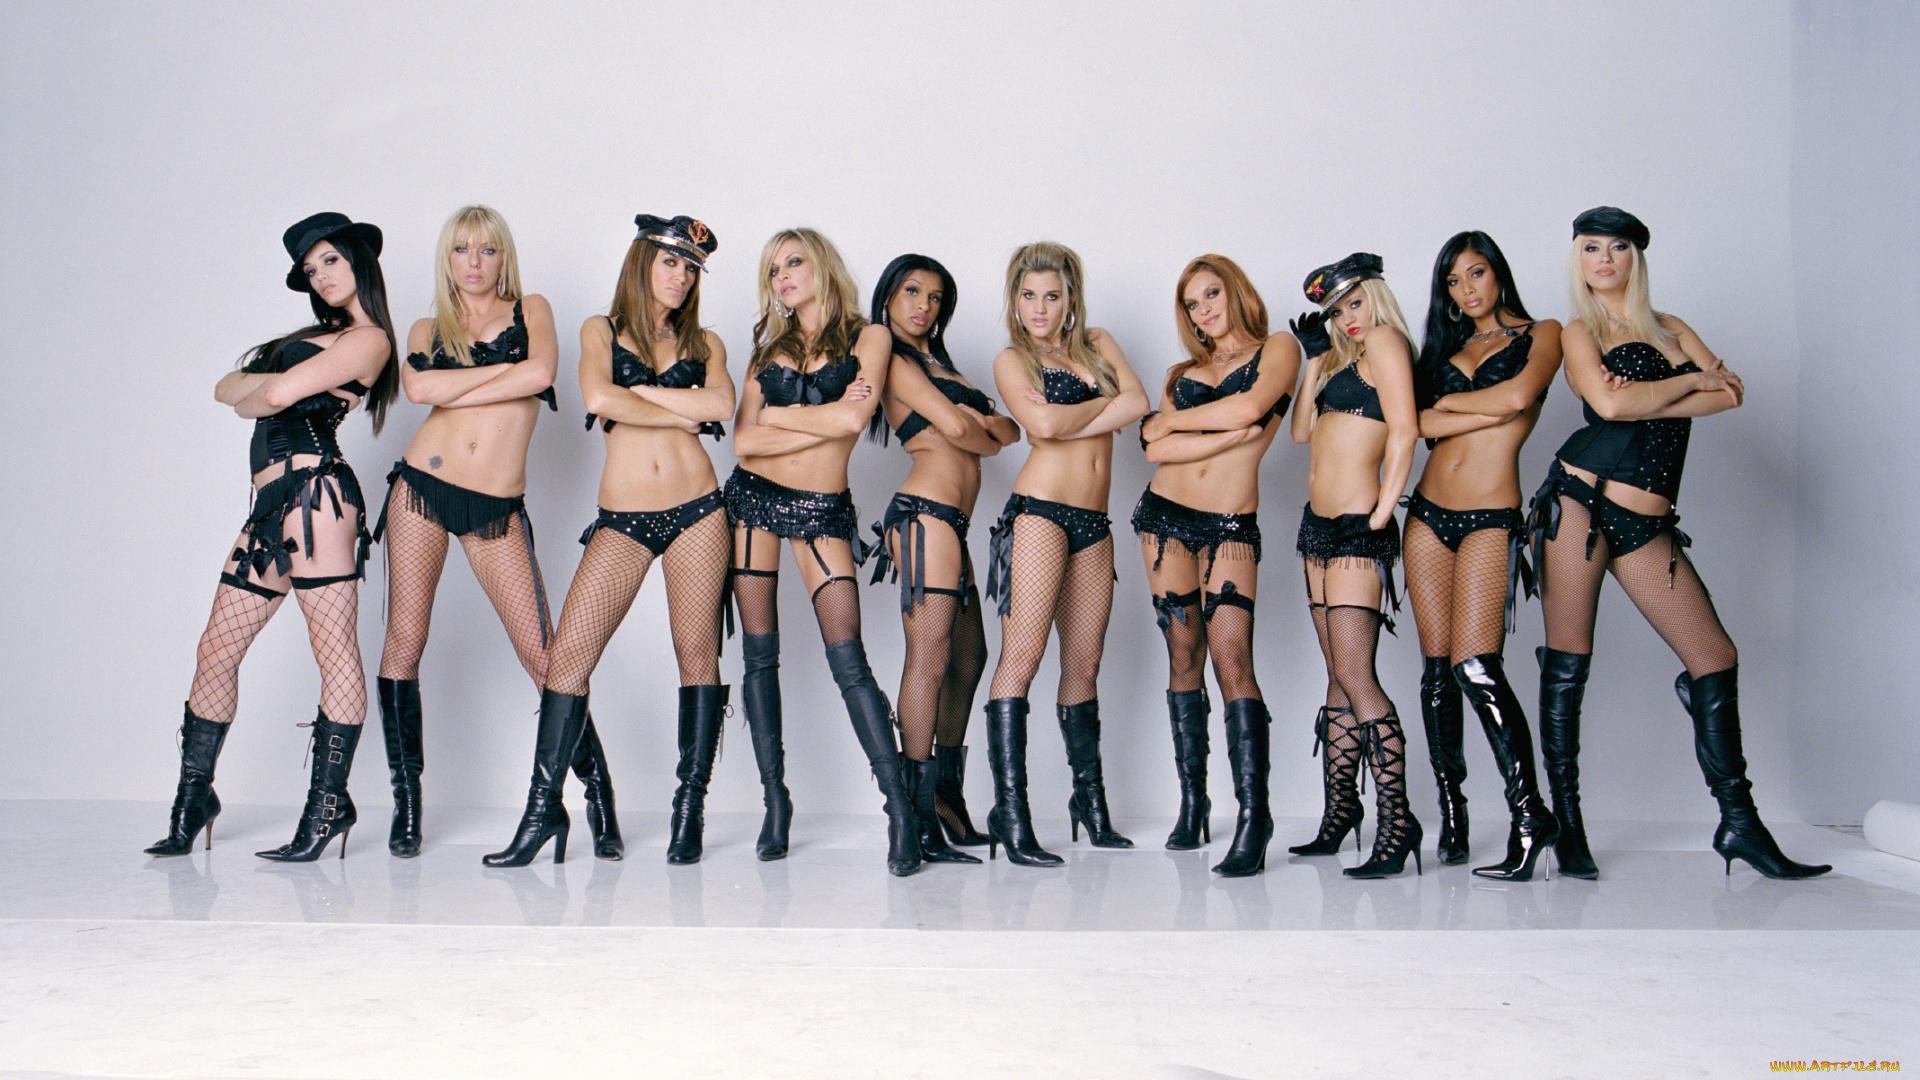 Group photo nude